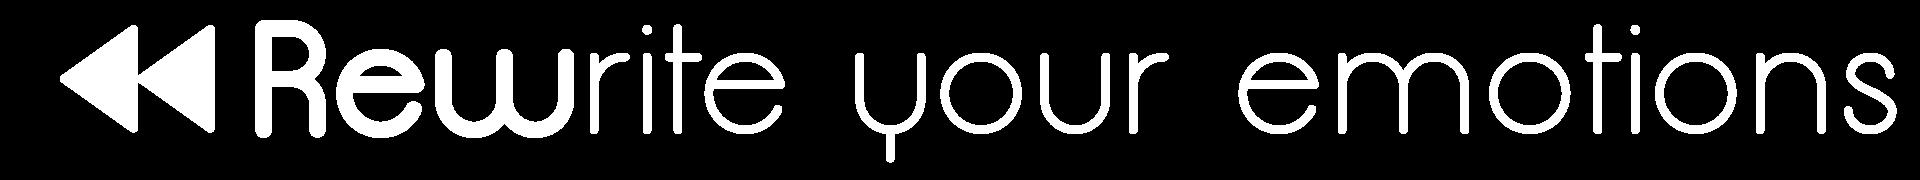 Rewrite-your-emotions-Atlaua